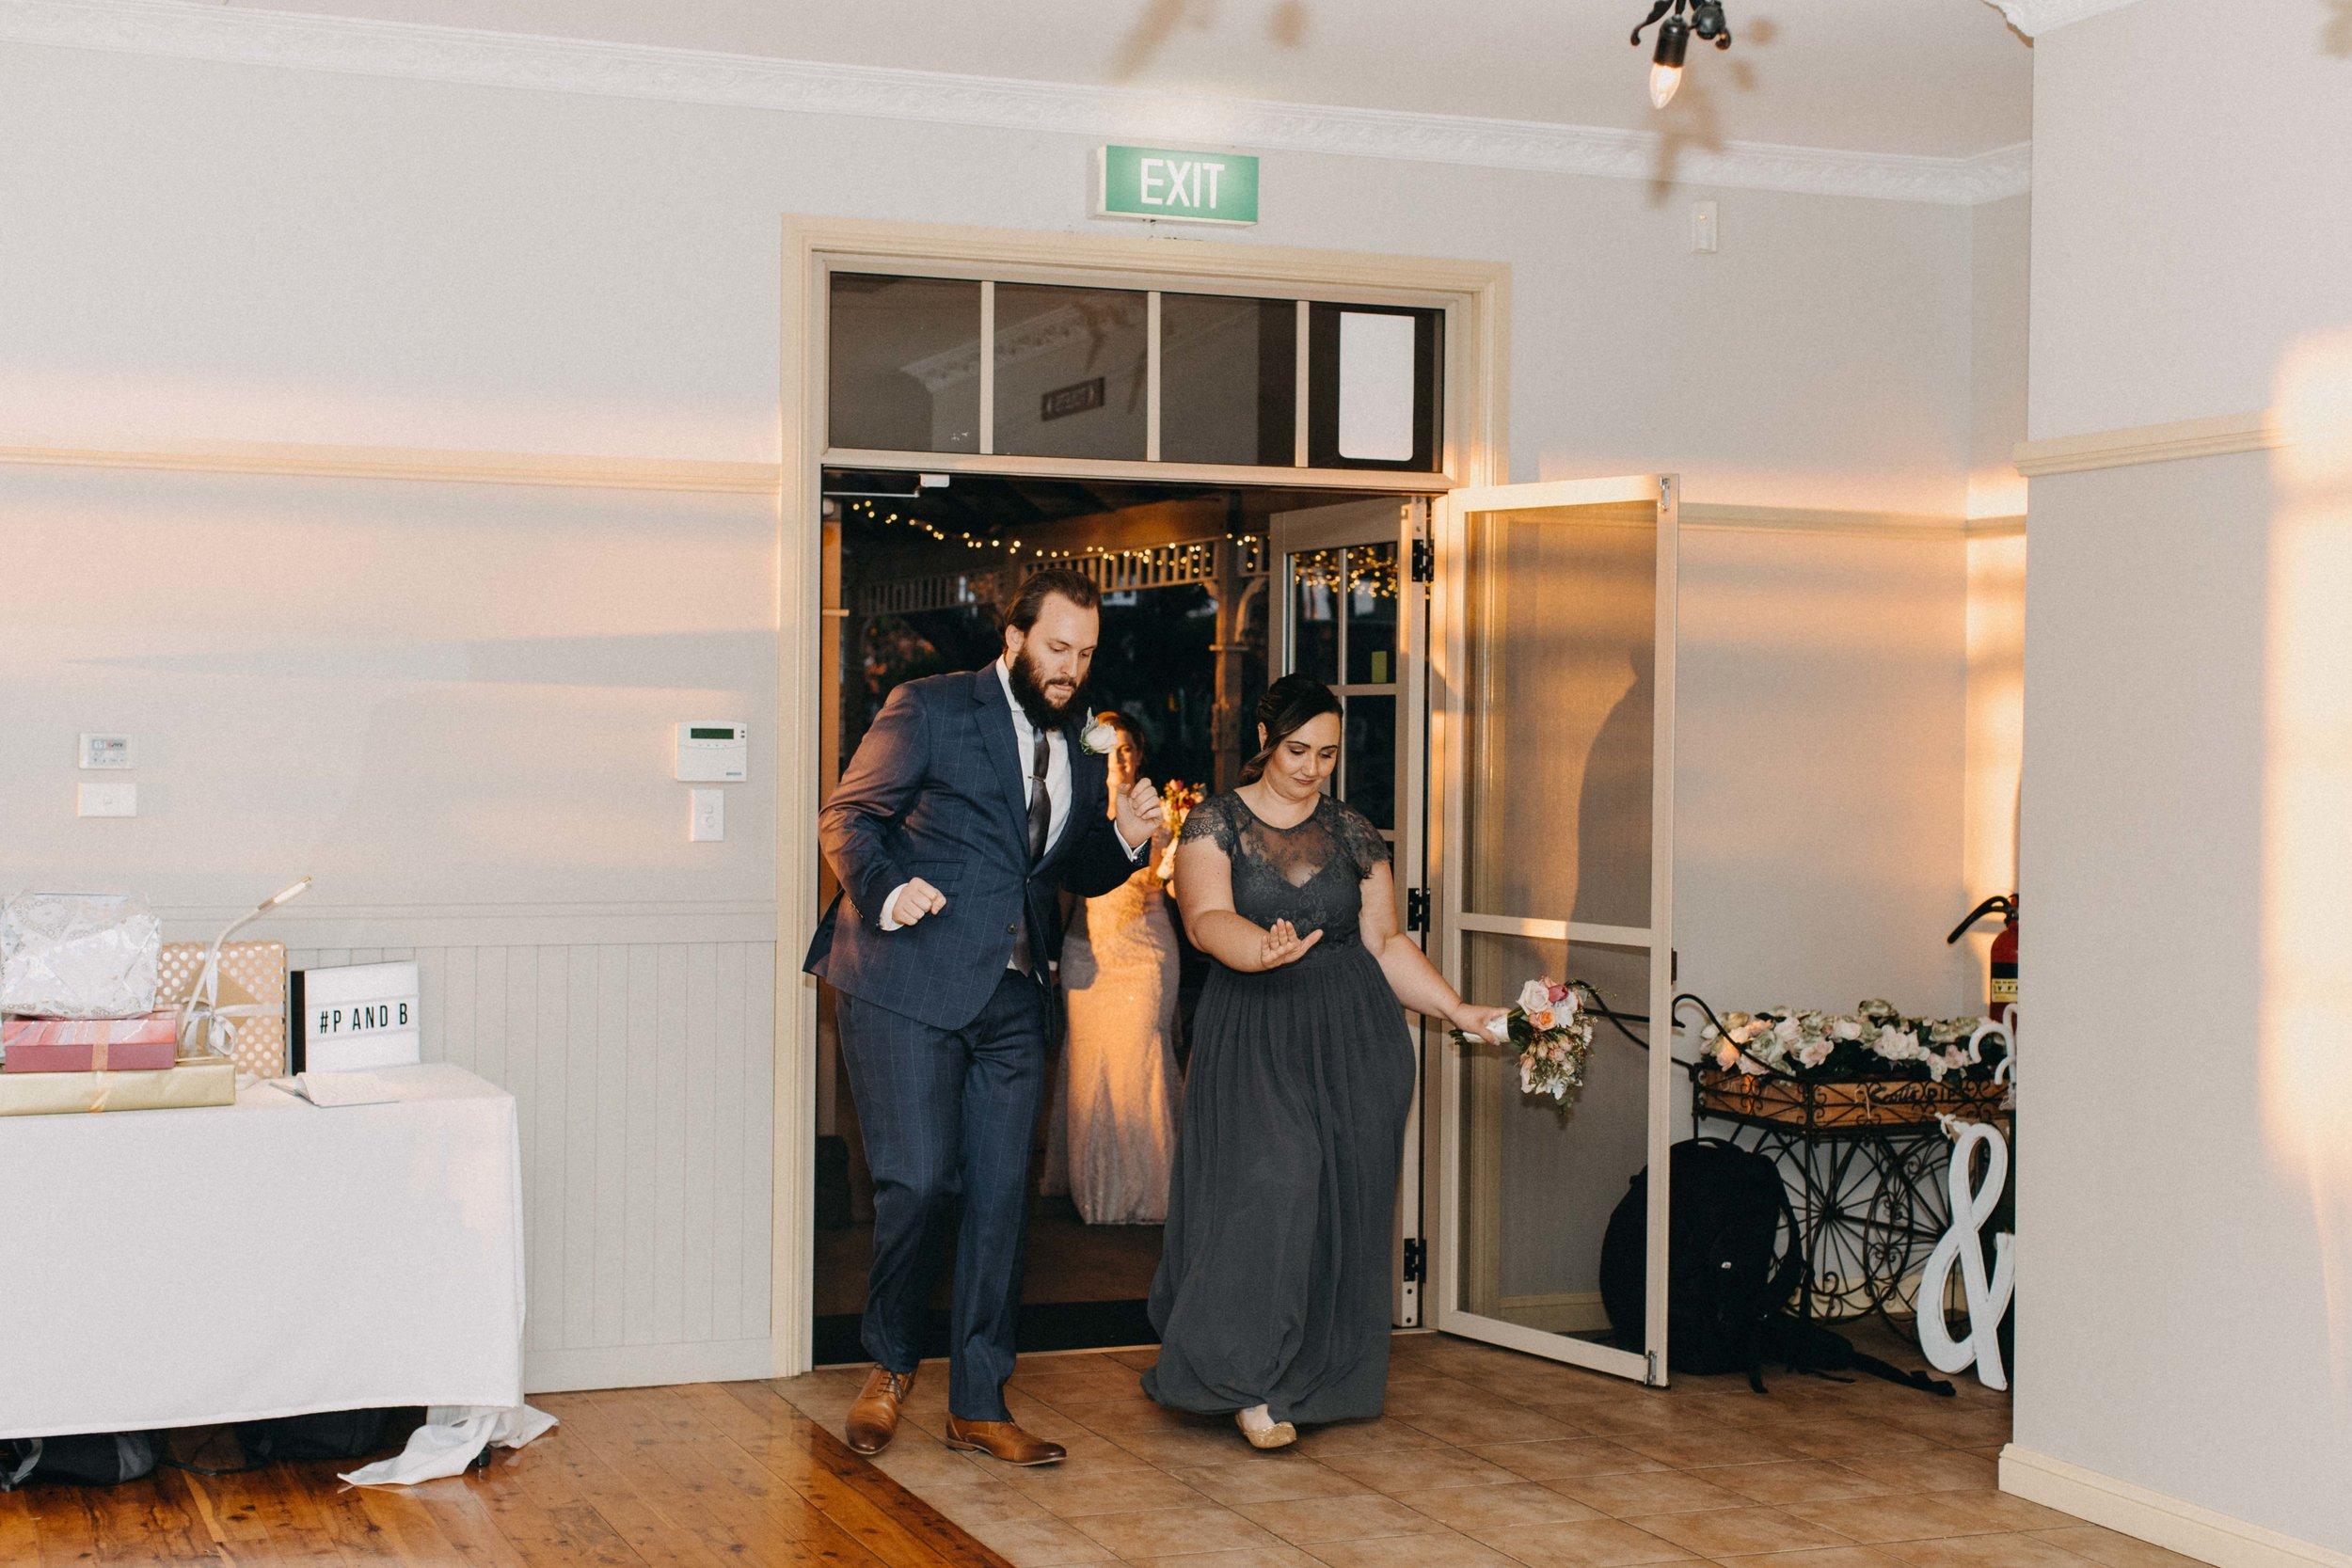 appin-house-wedding-macarthur-www.emilyobrienphotography.net-144.jpg